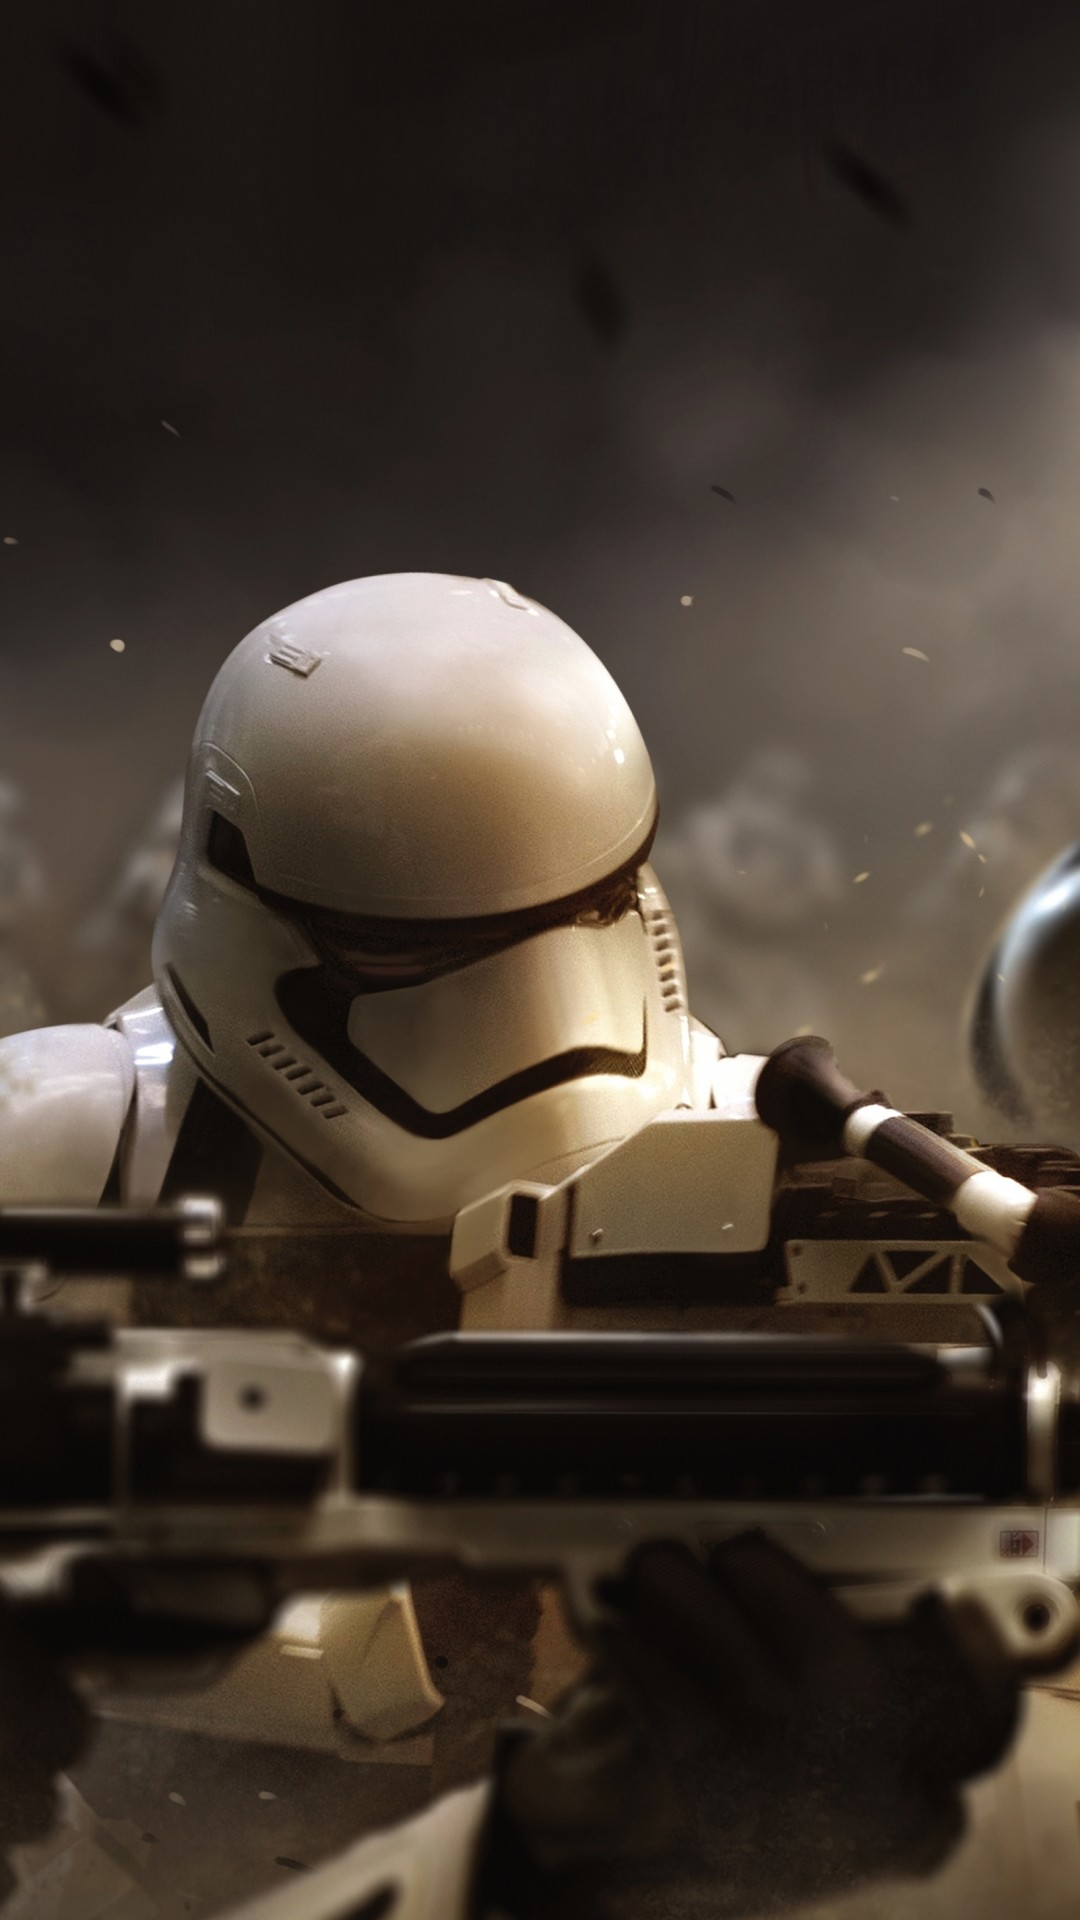 … Wallpaper Stormtrooper Offensive. Download: iPhone. Star …